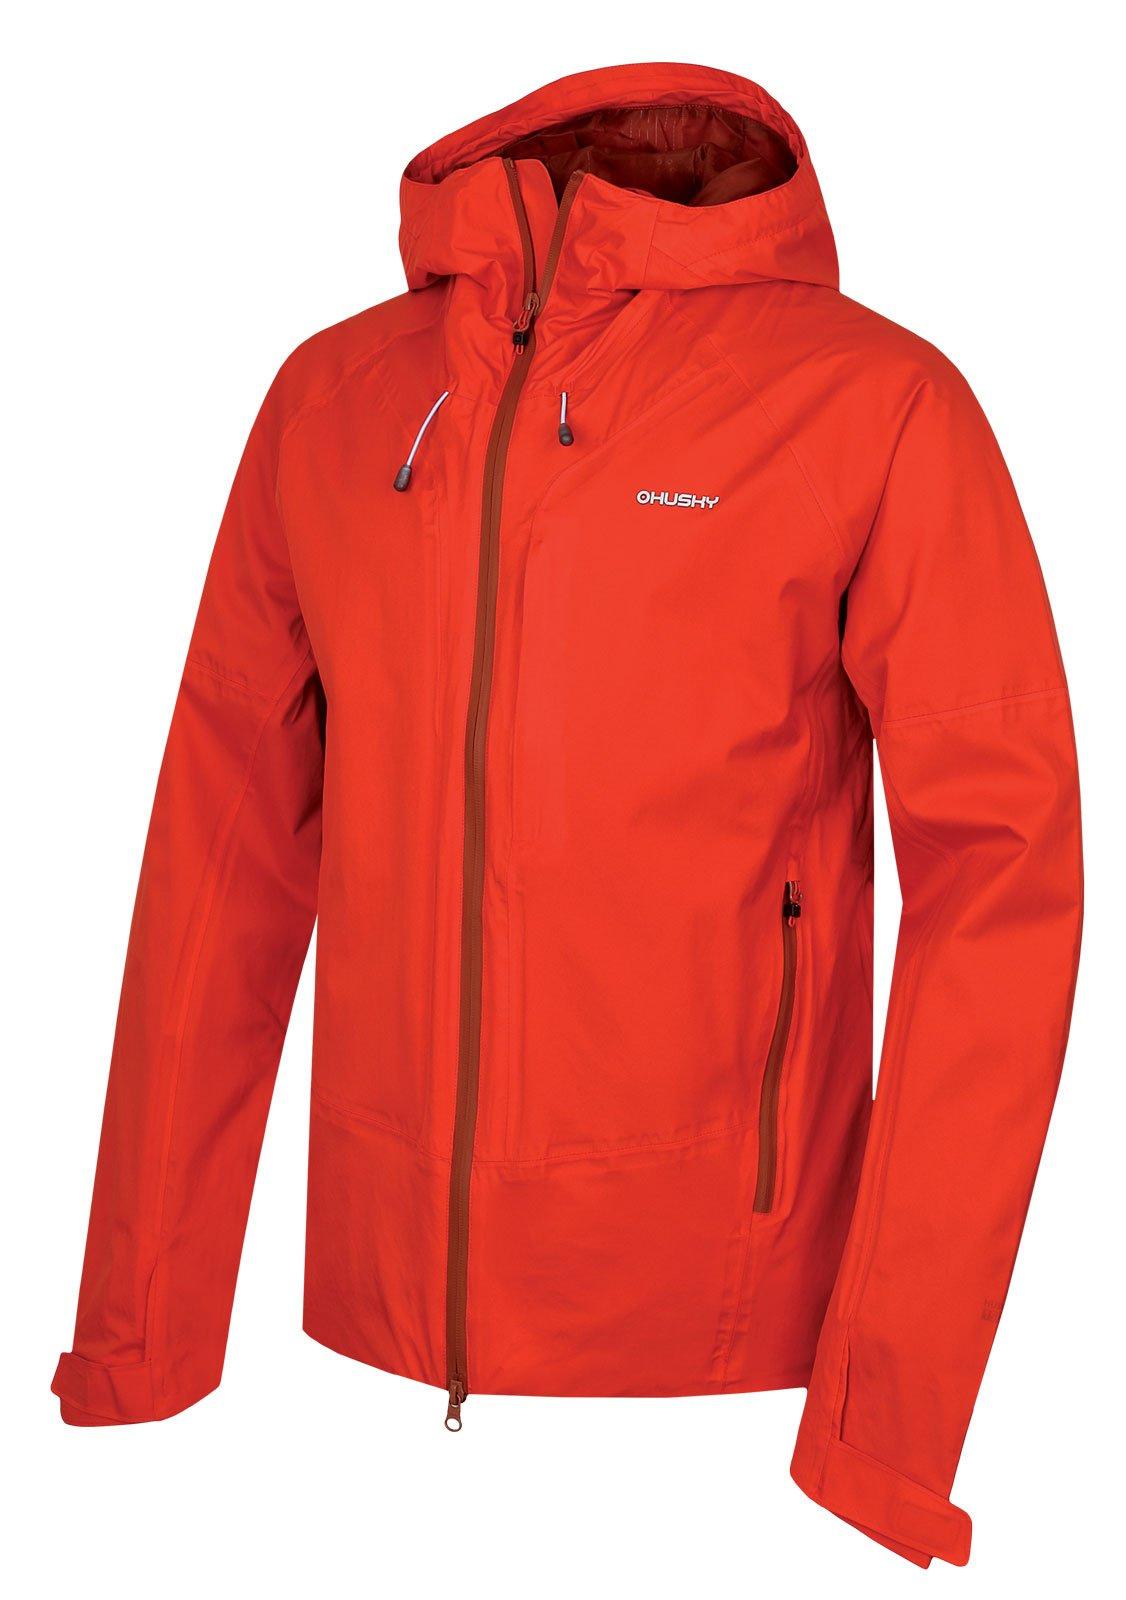 Husky Nicker M červená, XXL Pánska hardshellová bunda